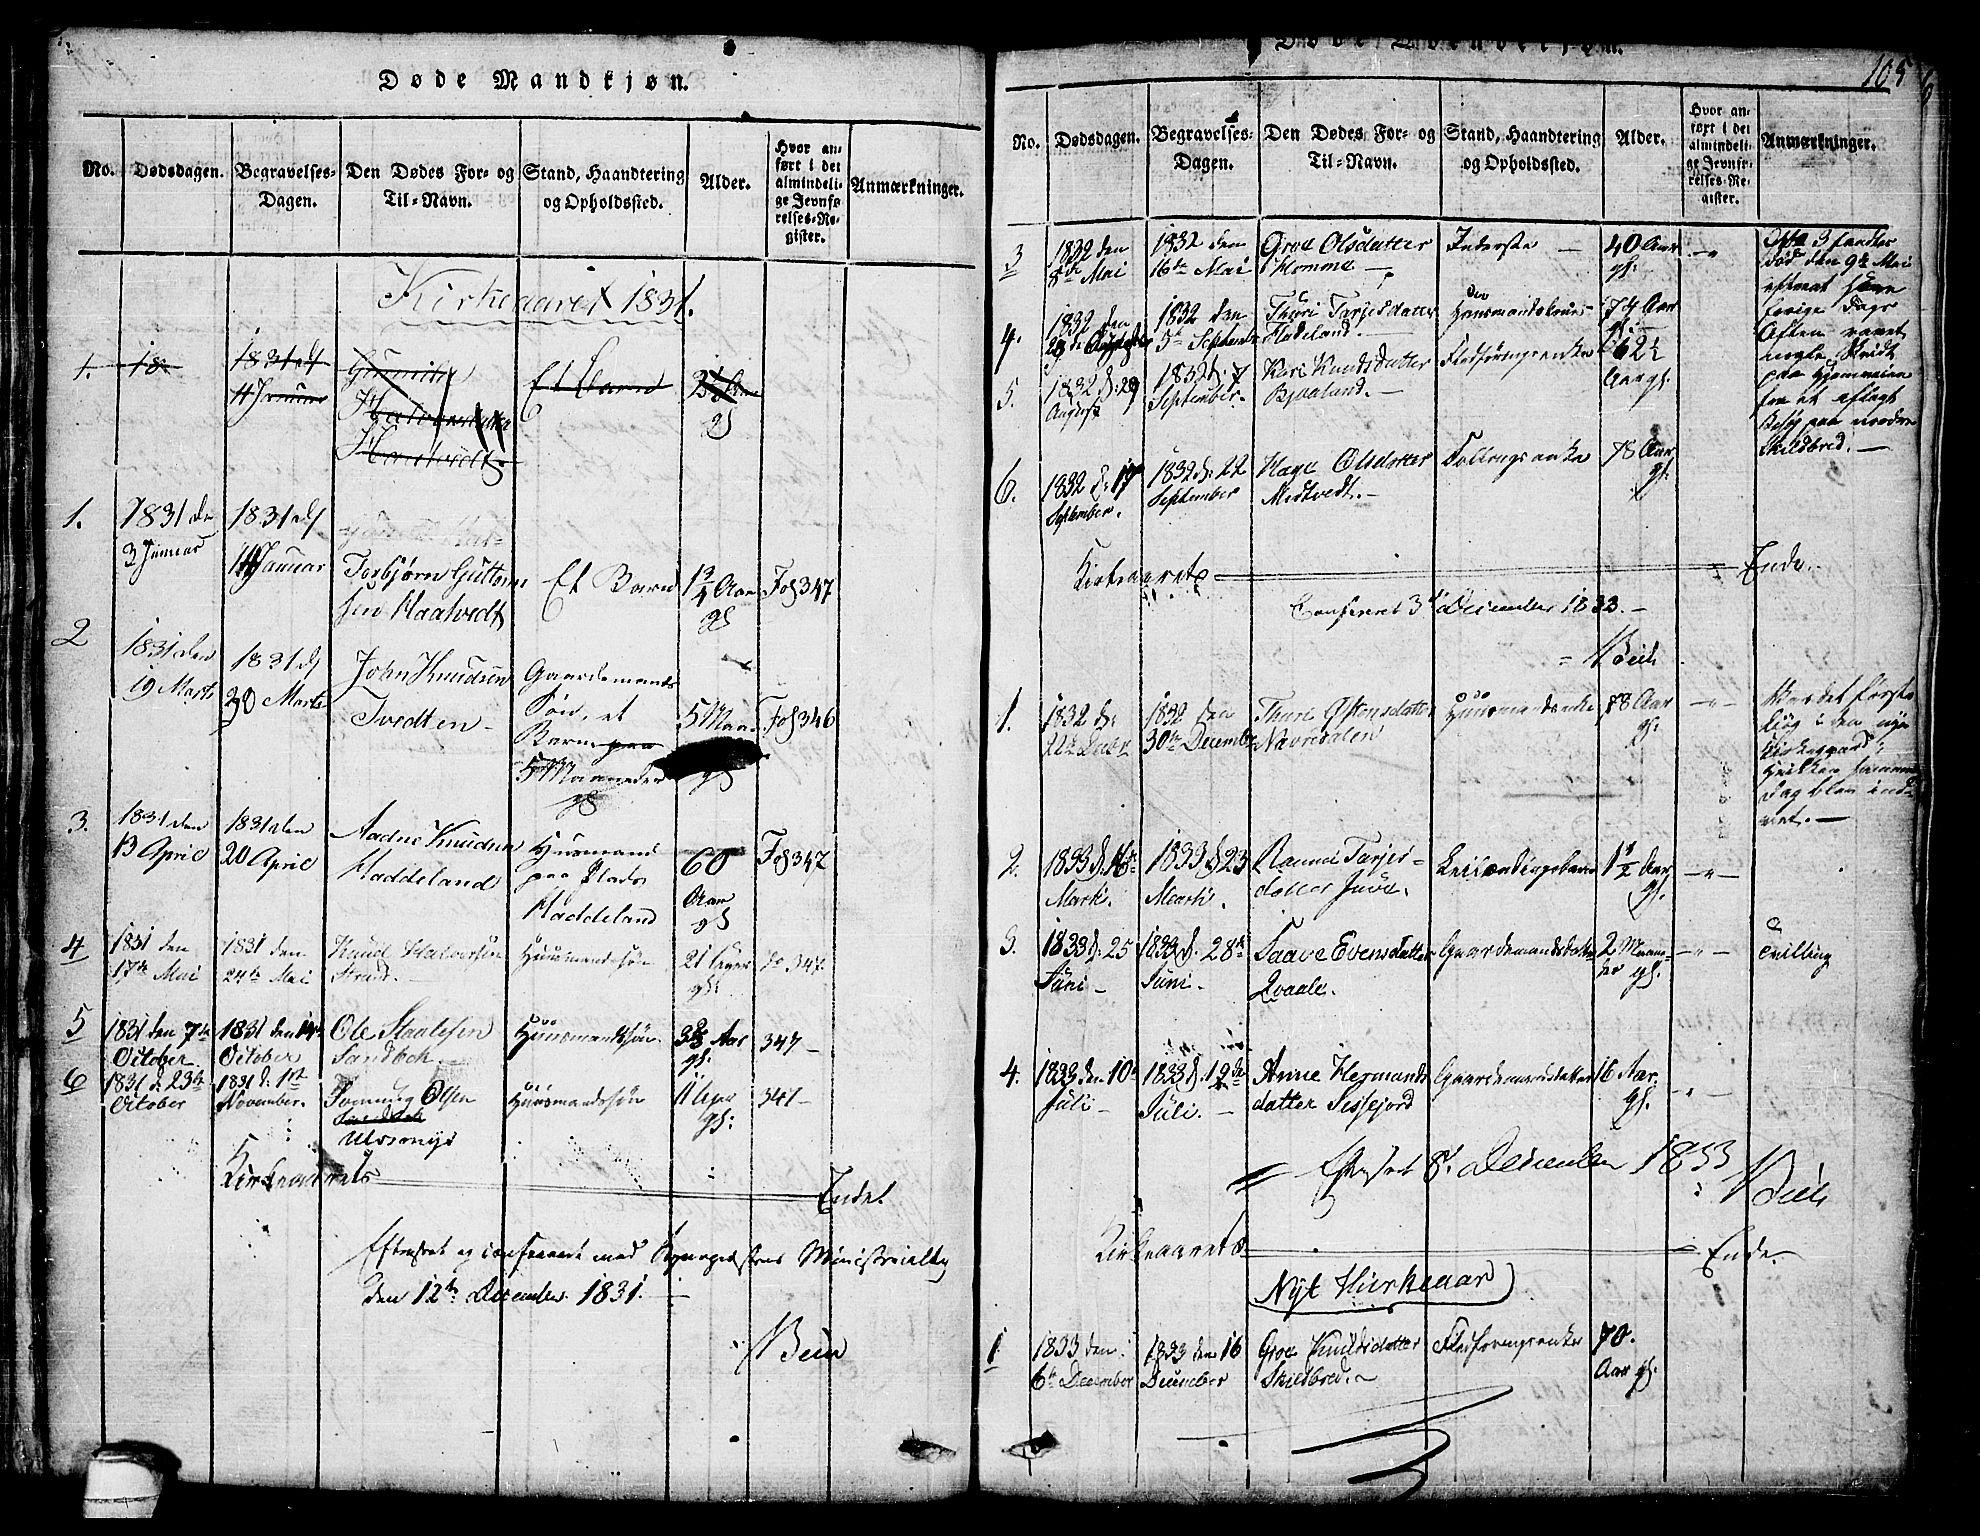 SAKO, Lårdal kirkebøker, G/Ga/L0001: Klokkerbok nr. I 1, 1815-1861, s. 105